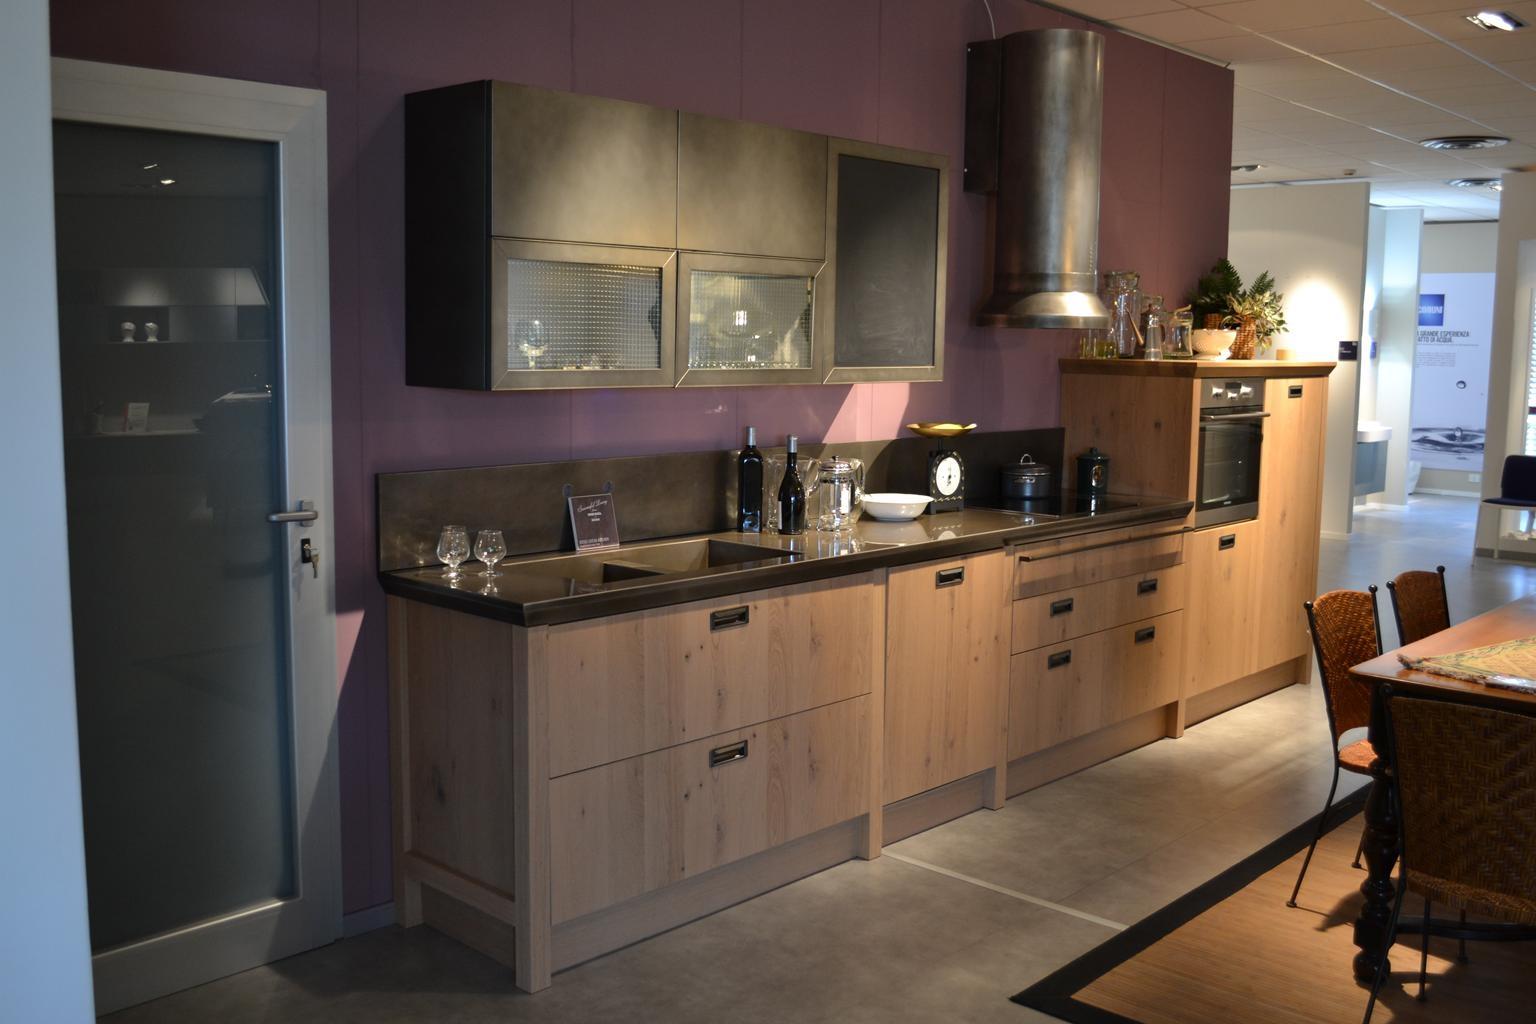 Cucina scavolini diesel cucine a prezzi scontati - Scavolini prezzi cucine ...